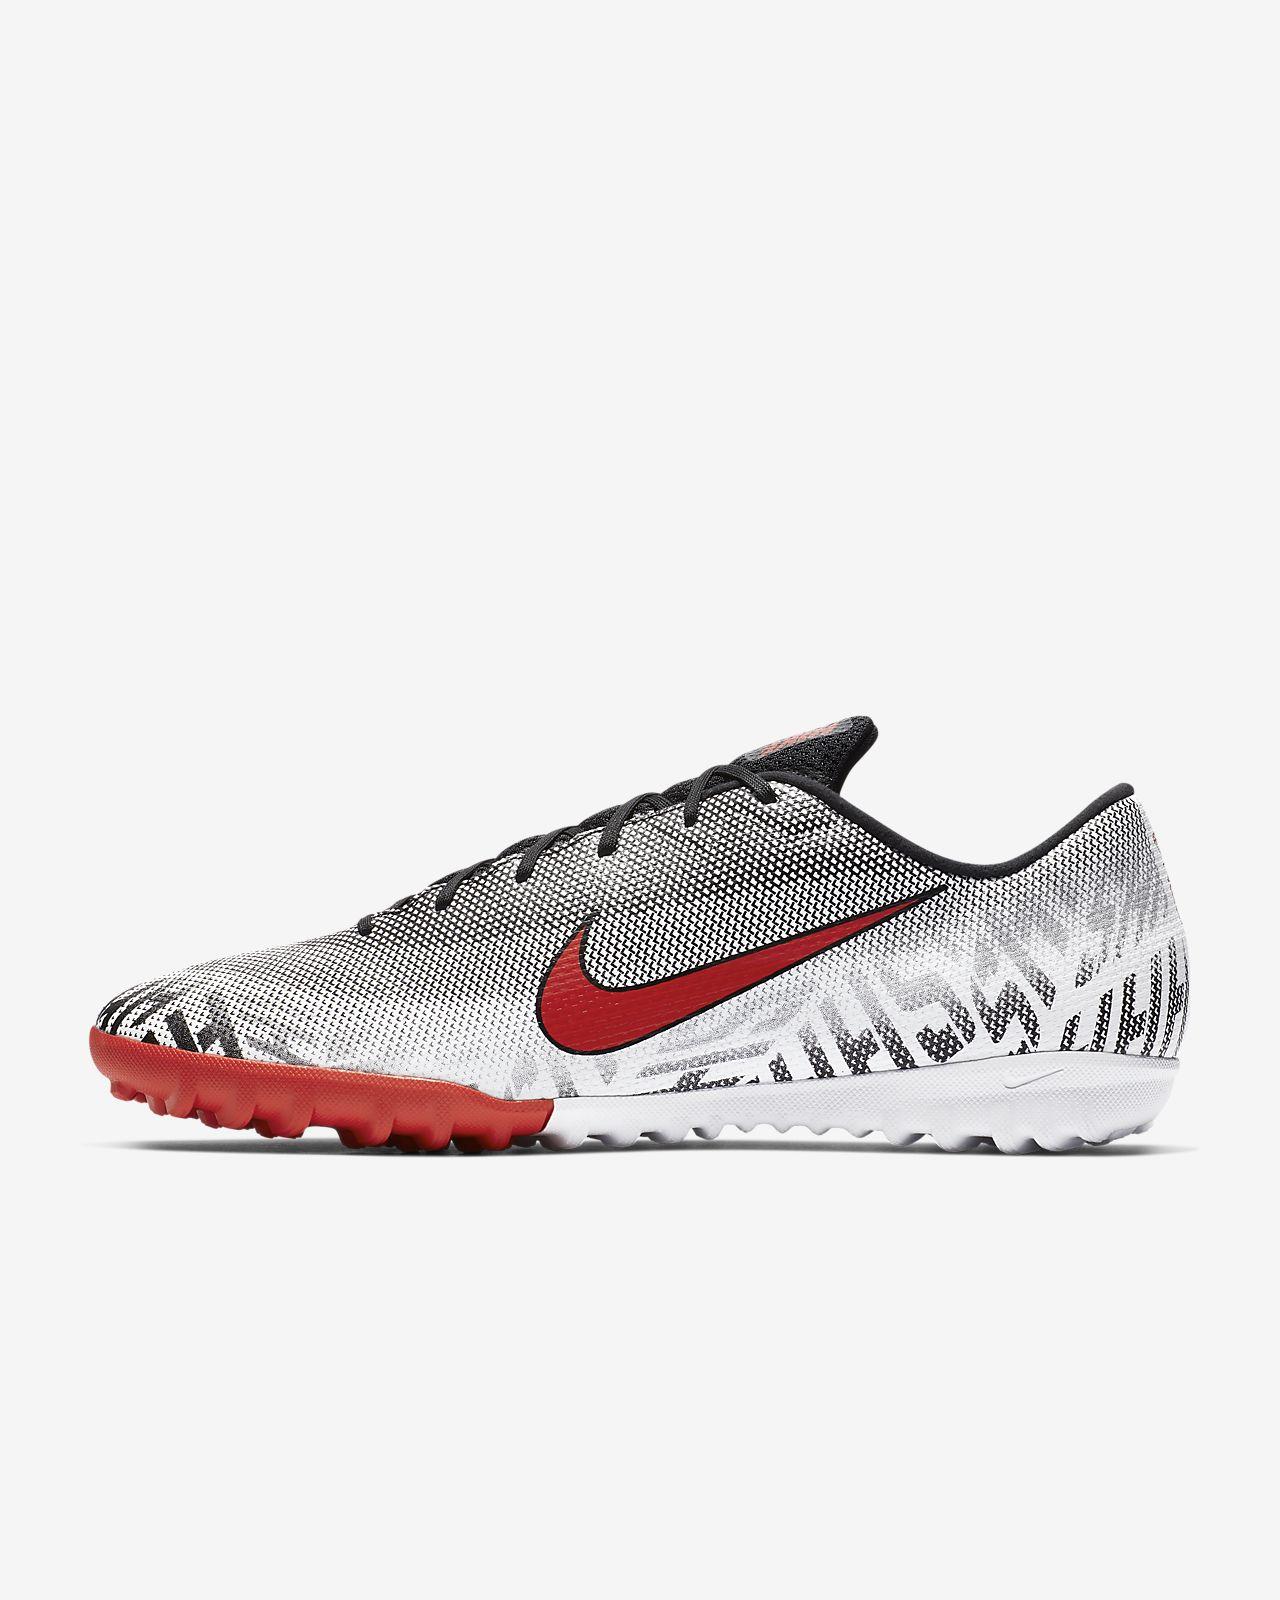 on sale 00b3d 20766 ... Nike Mercurial Vapor XII Academy Neymar TF Artificial-Turf Soccer Shoe